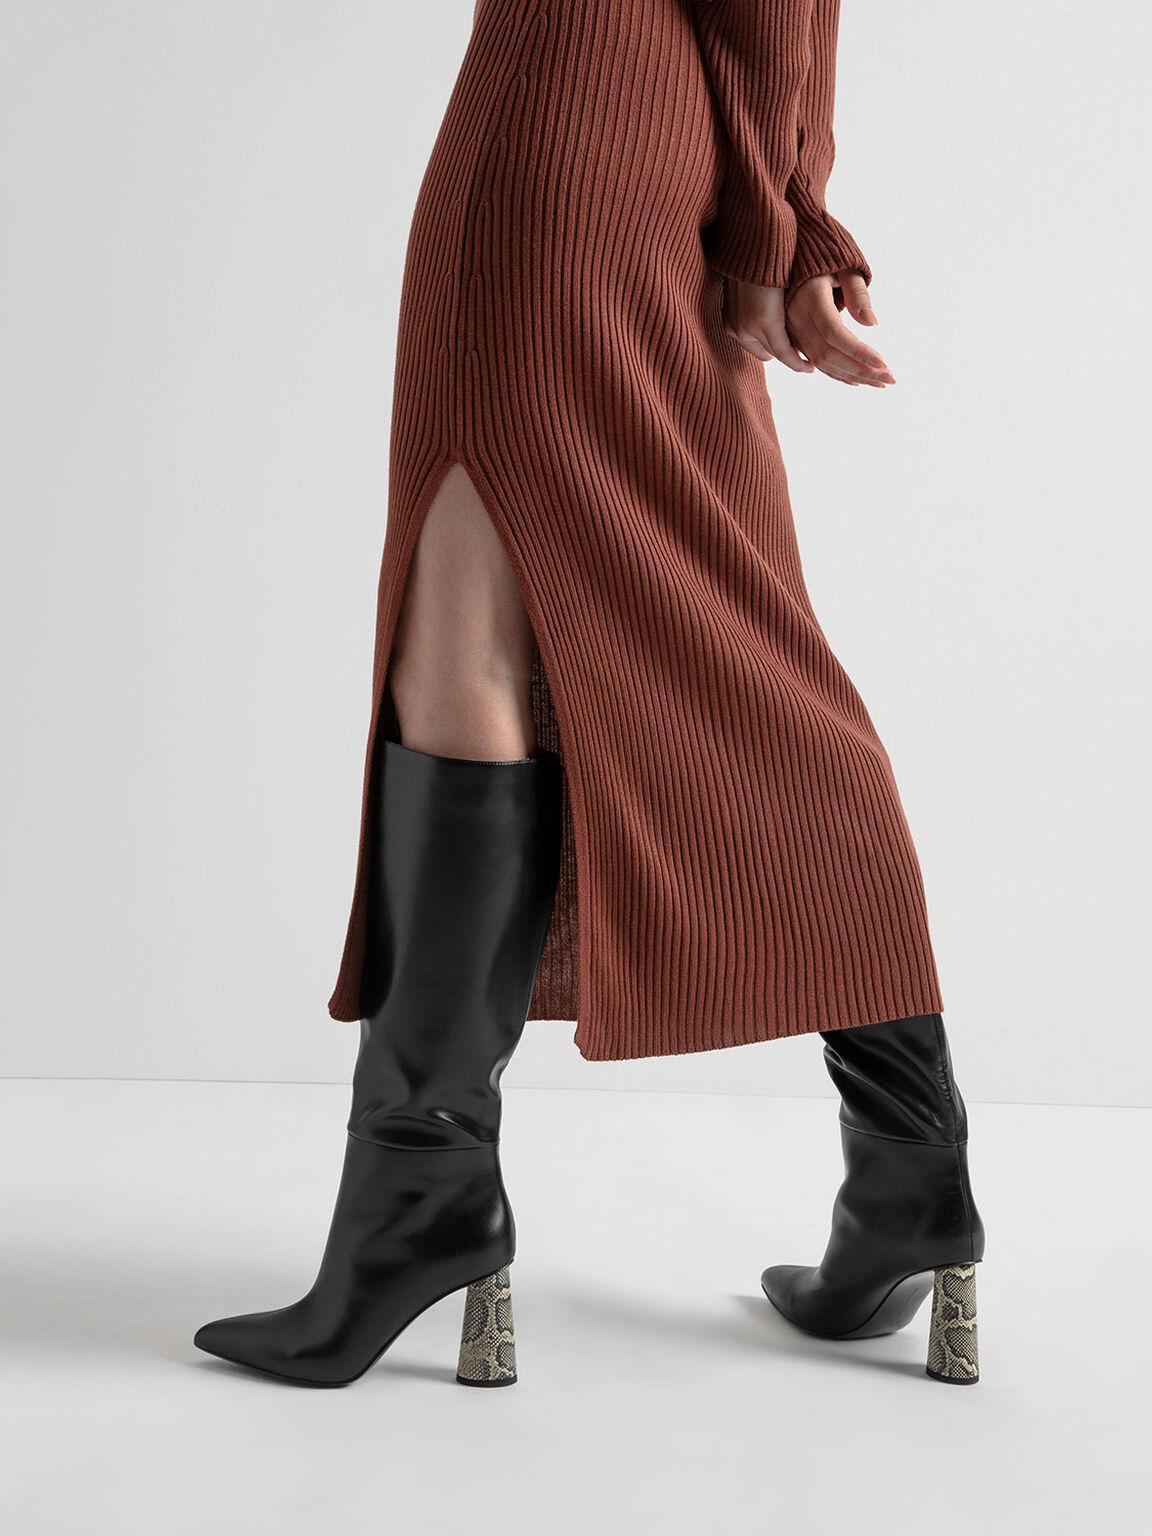 Knee High Heeled Boots, Black, hi-res